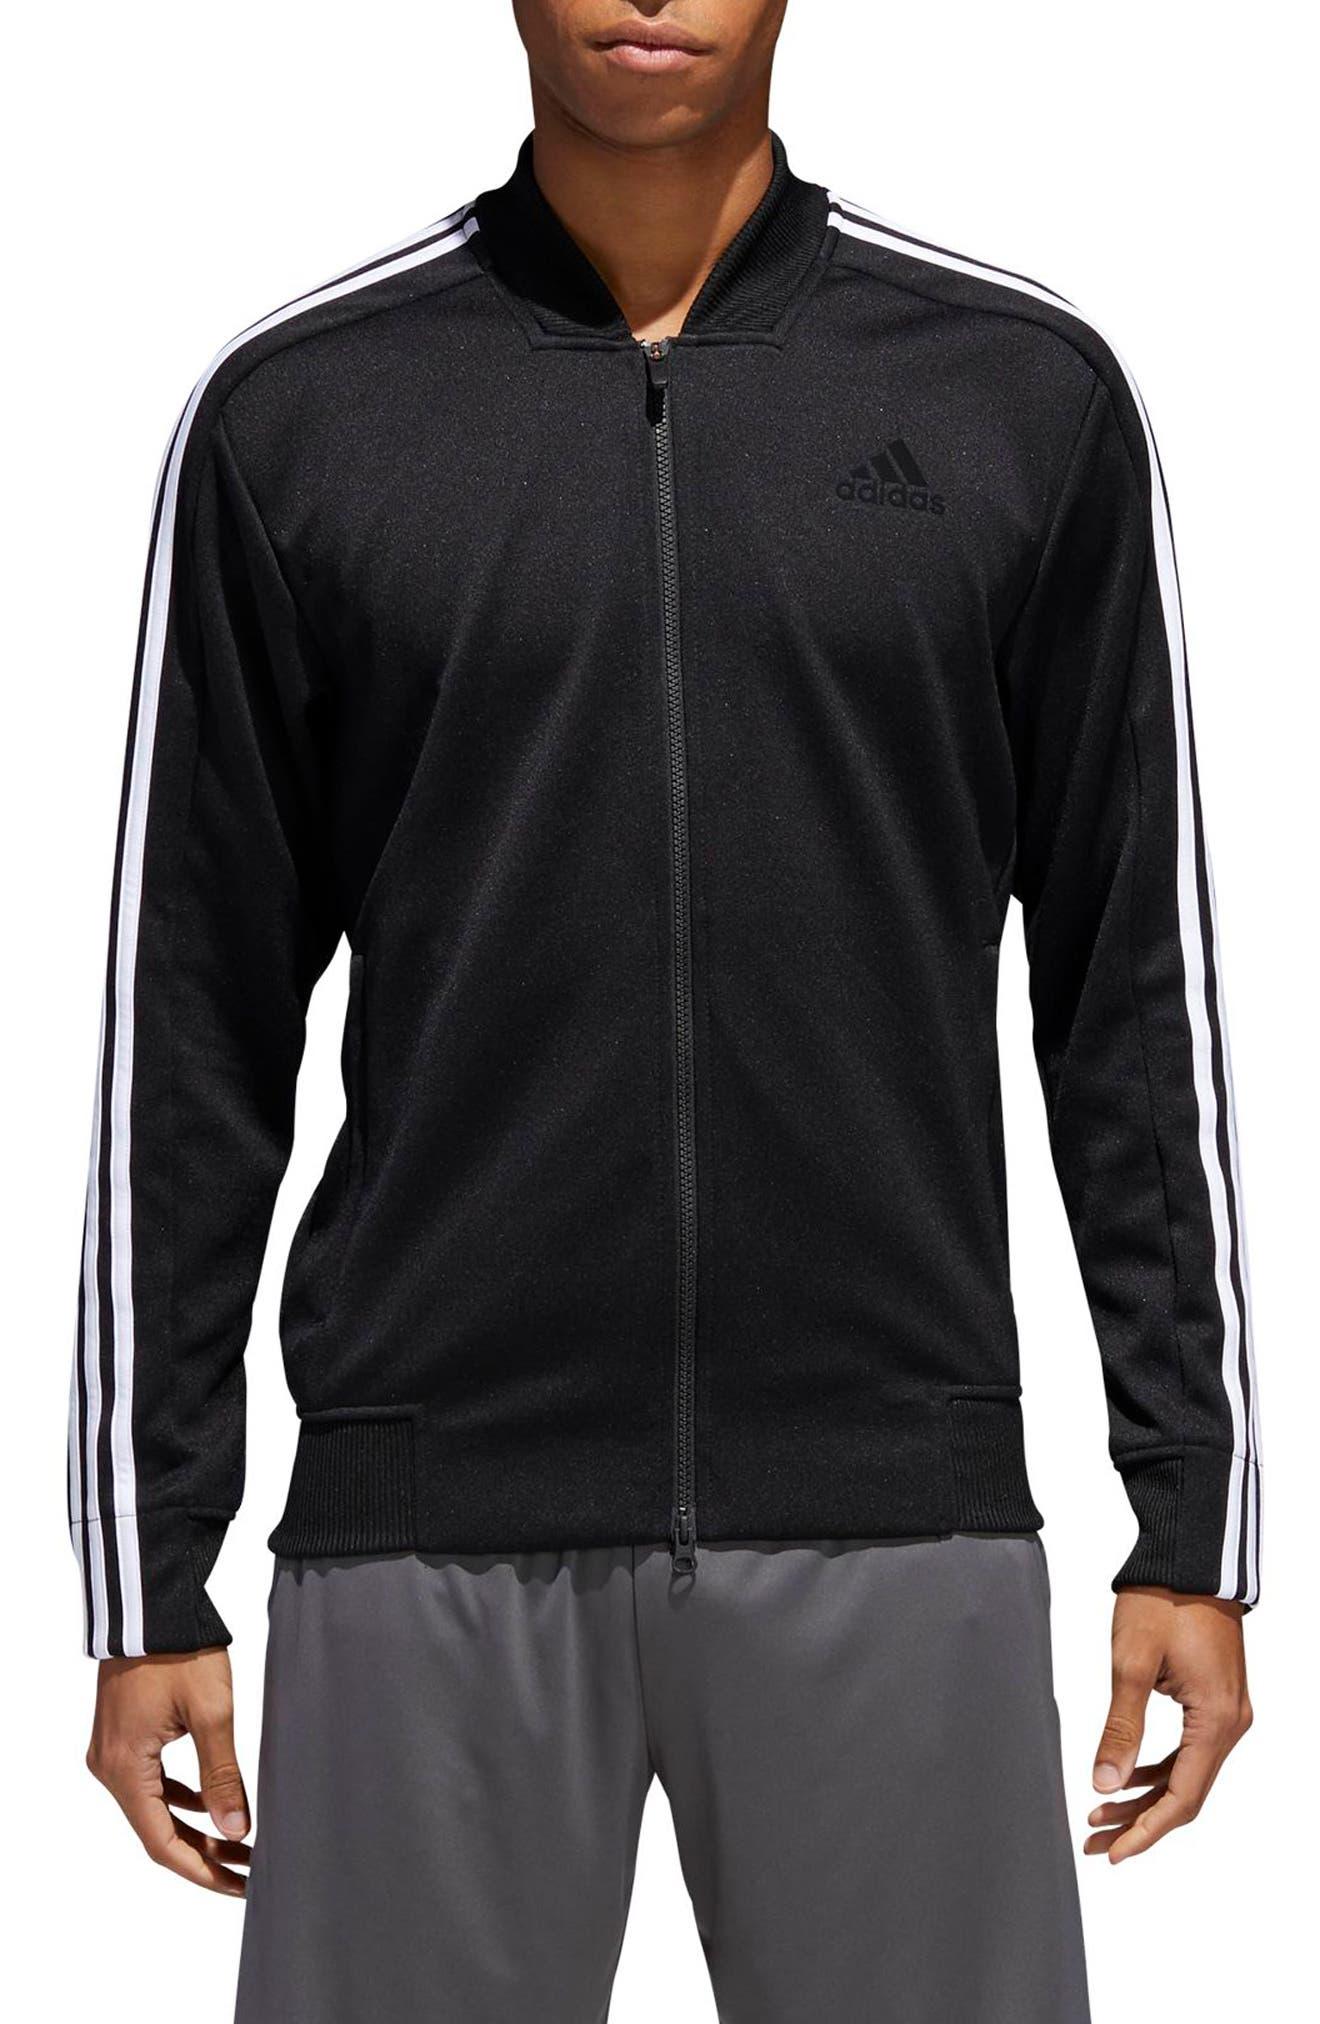 ID Trek Track Jacket,                         Main,                         color, Black / White